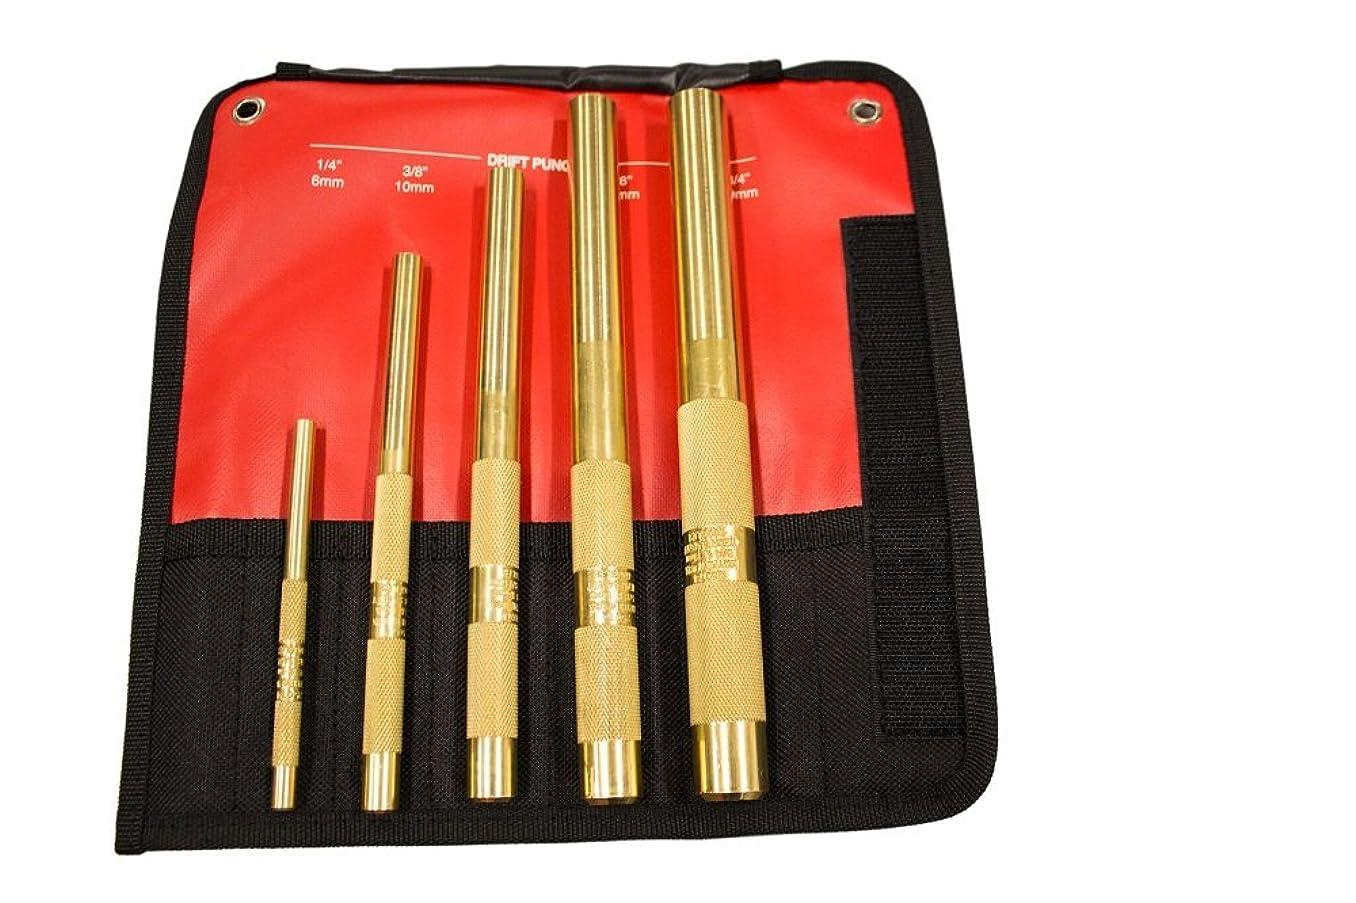 Mayhew Tools 67003 Brass Drift Punch Set (5 Piece)